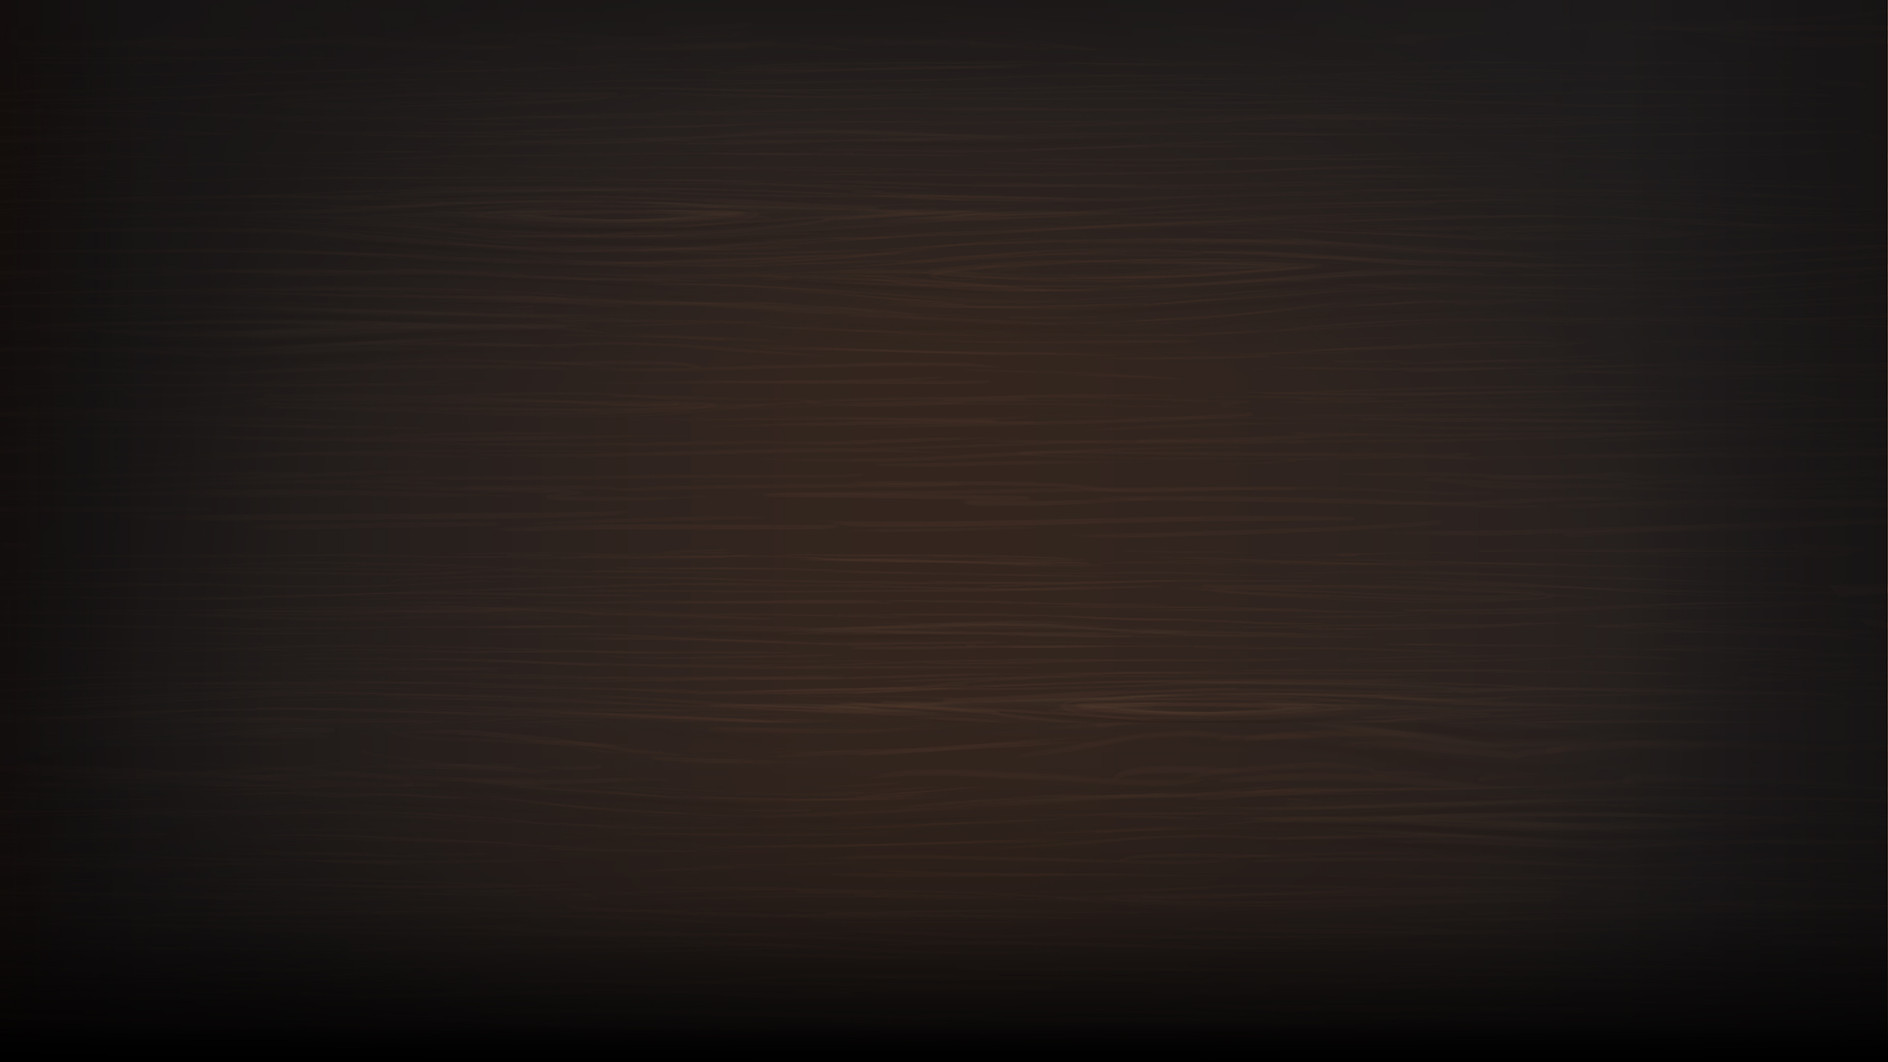 texture wood1555.jpg